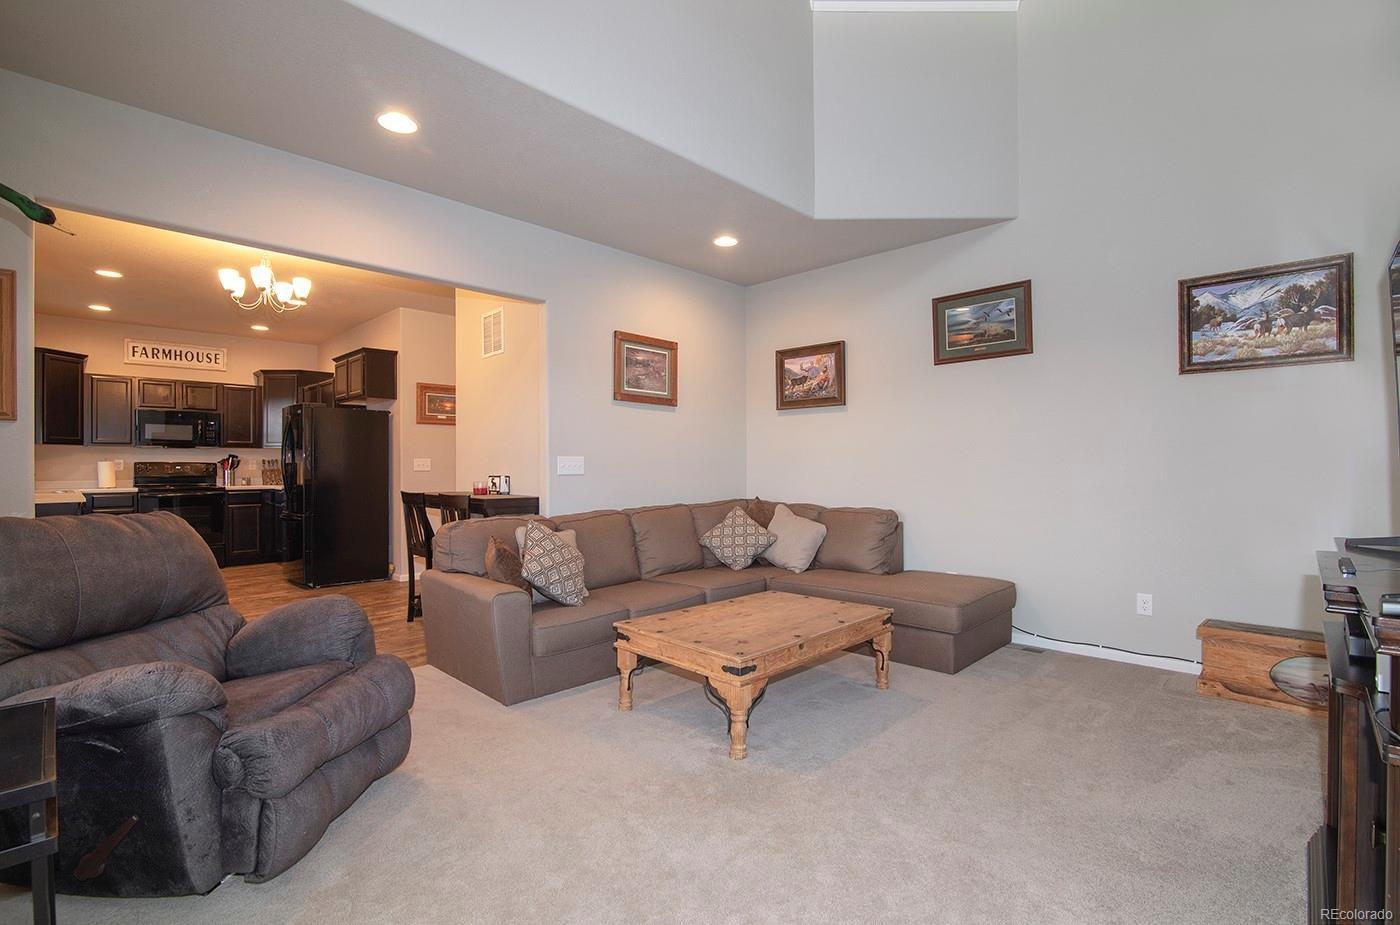 MLS# 7058019 - 7 - 9615 Rubicon Drive, Colorado Springs, CO 80925